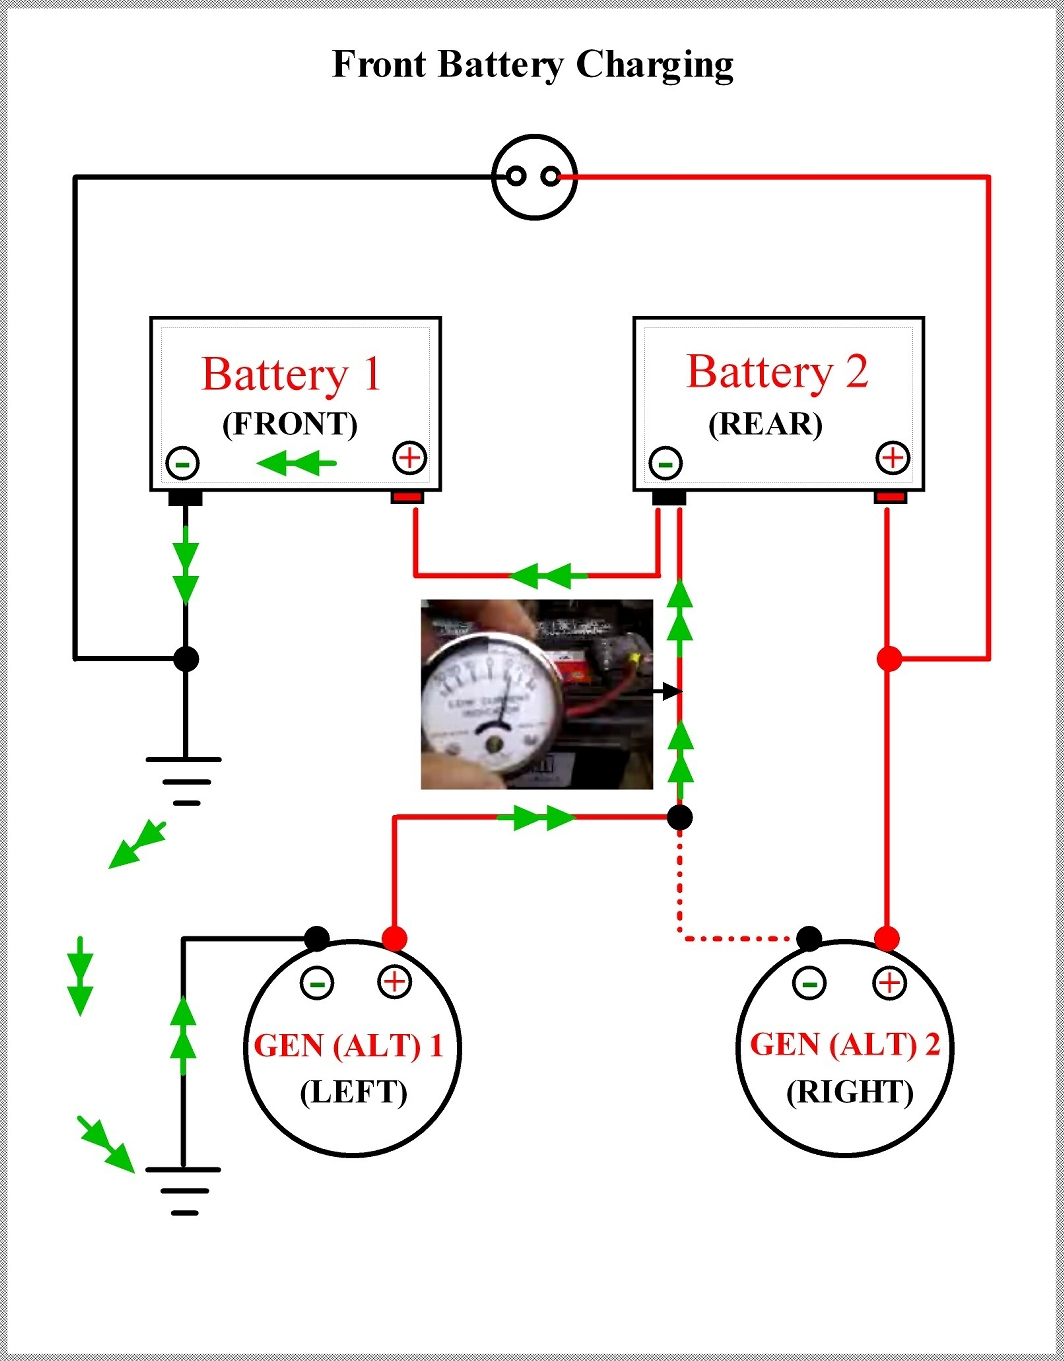 WRG-5568] M1009 Alternator Wiring Diagram on m998 wiring diagram, m38a1 wiring diagram, m939 wiring diagram, general wiring diagram, mutt wiring diagram, m1010 wiring diagram, m813 wiring diagram, cucv wiring diagram, m1008 wiring diagram, m11 wiring diagram, 4x4 wiring diagram, m35a2 wiring diagram, m715 wiring diagram, chevy wiring diagram, m151a2 wiring diagram, jeep wiring diagram, humvee wiring diagram, truck wiring diagram, m12 wiring diagram, trailers wiring diagram,